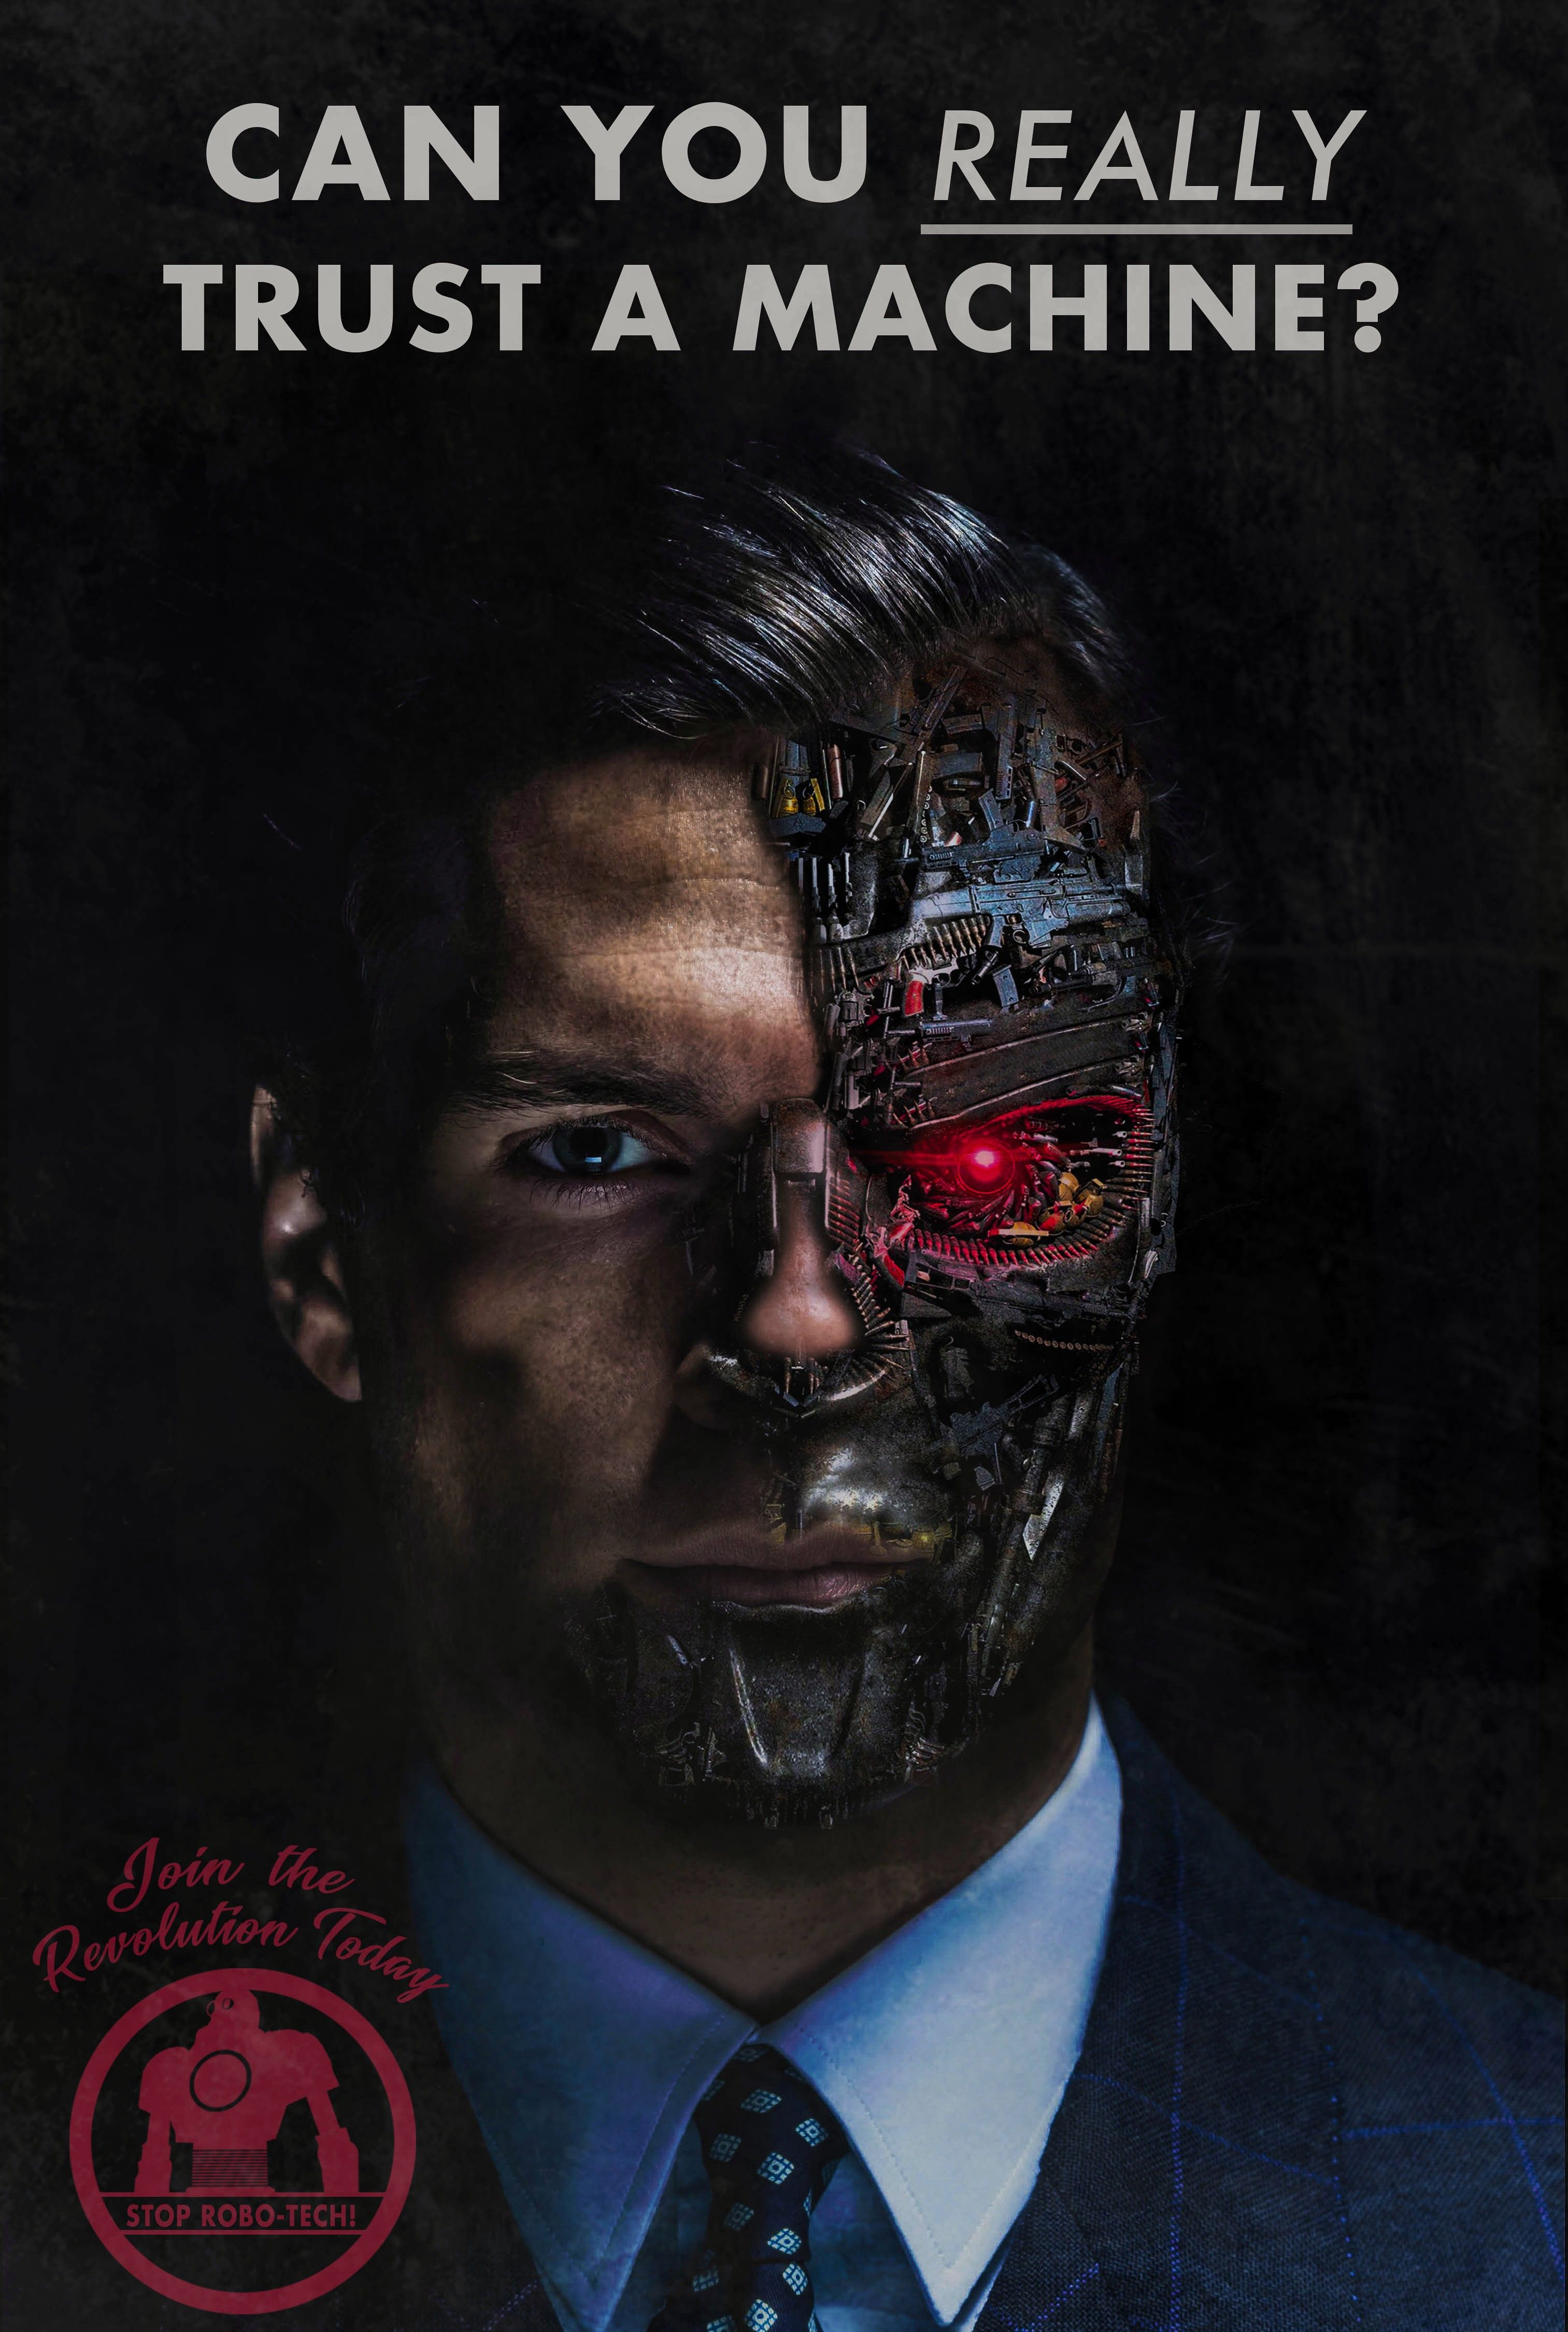 Fake propaganda poster I made for a robotics poster